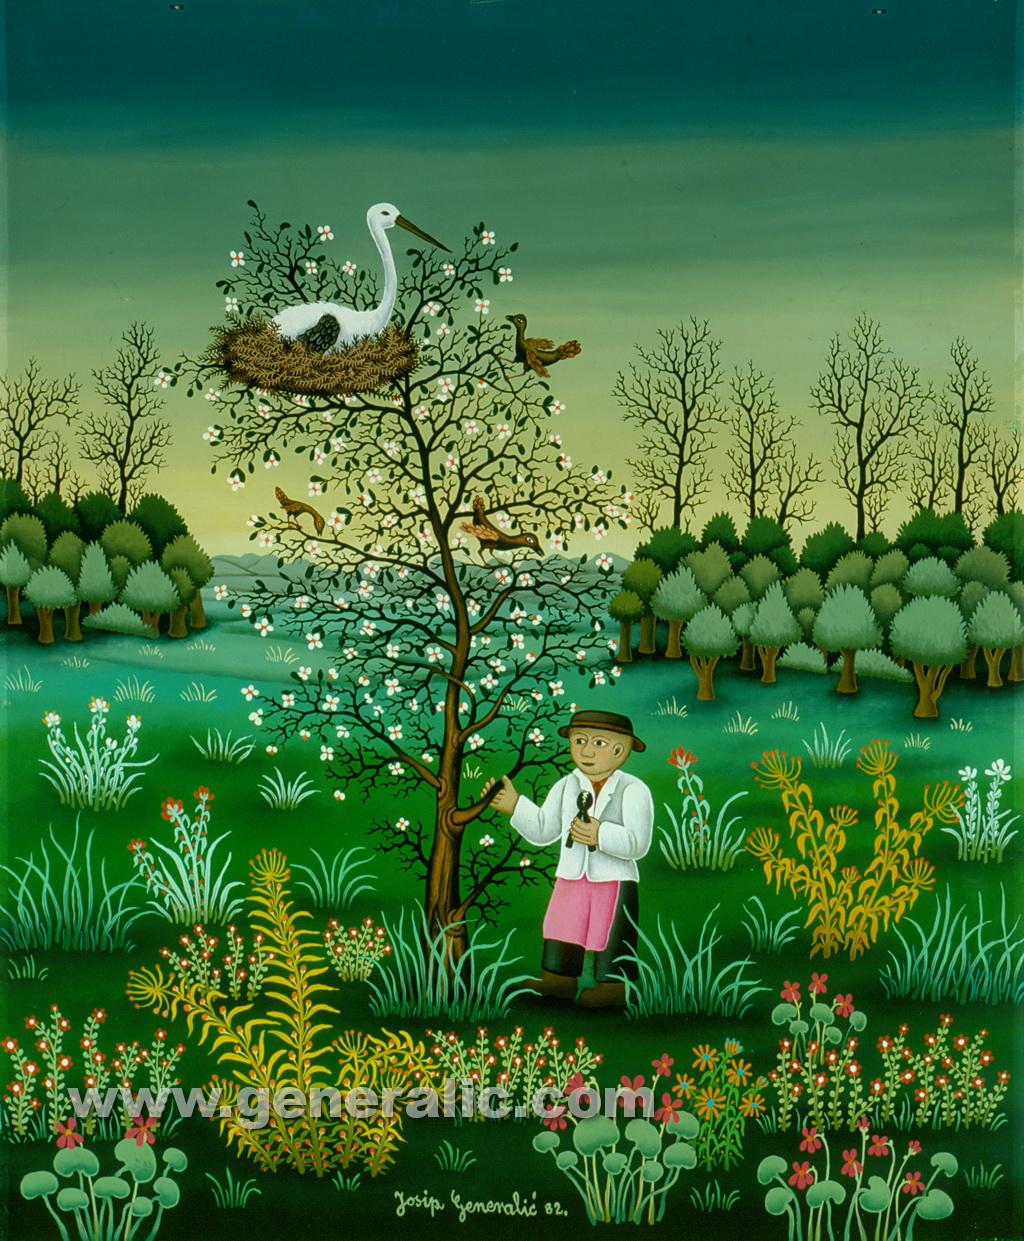 Josip Generalic, 1982, Stork on a tree, oil on glass, 55x45 cm